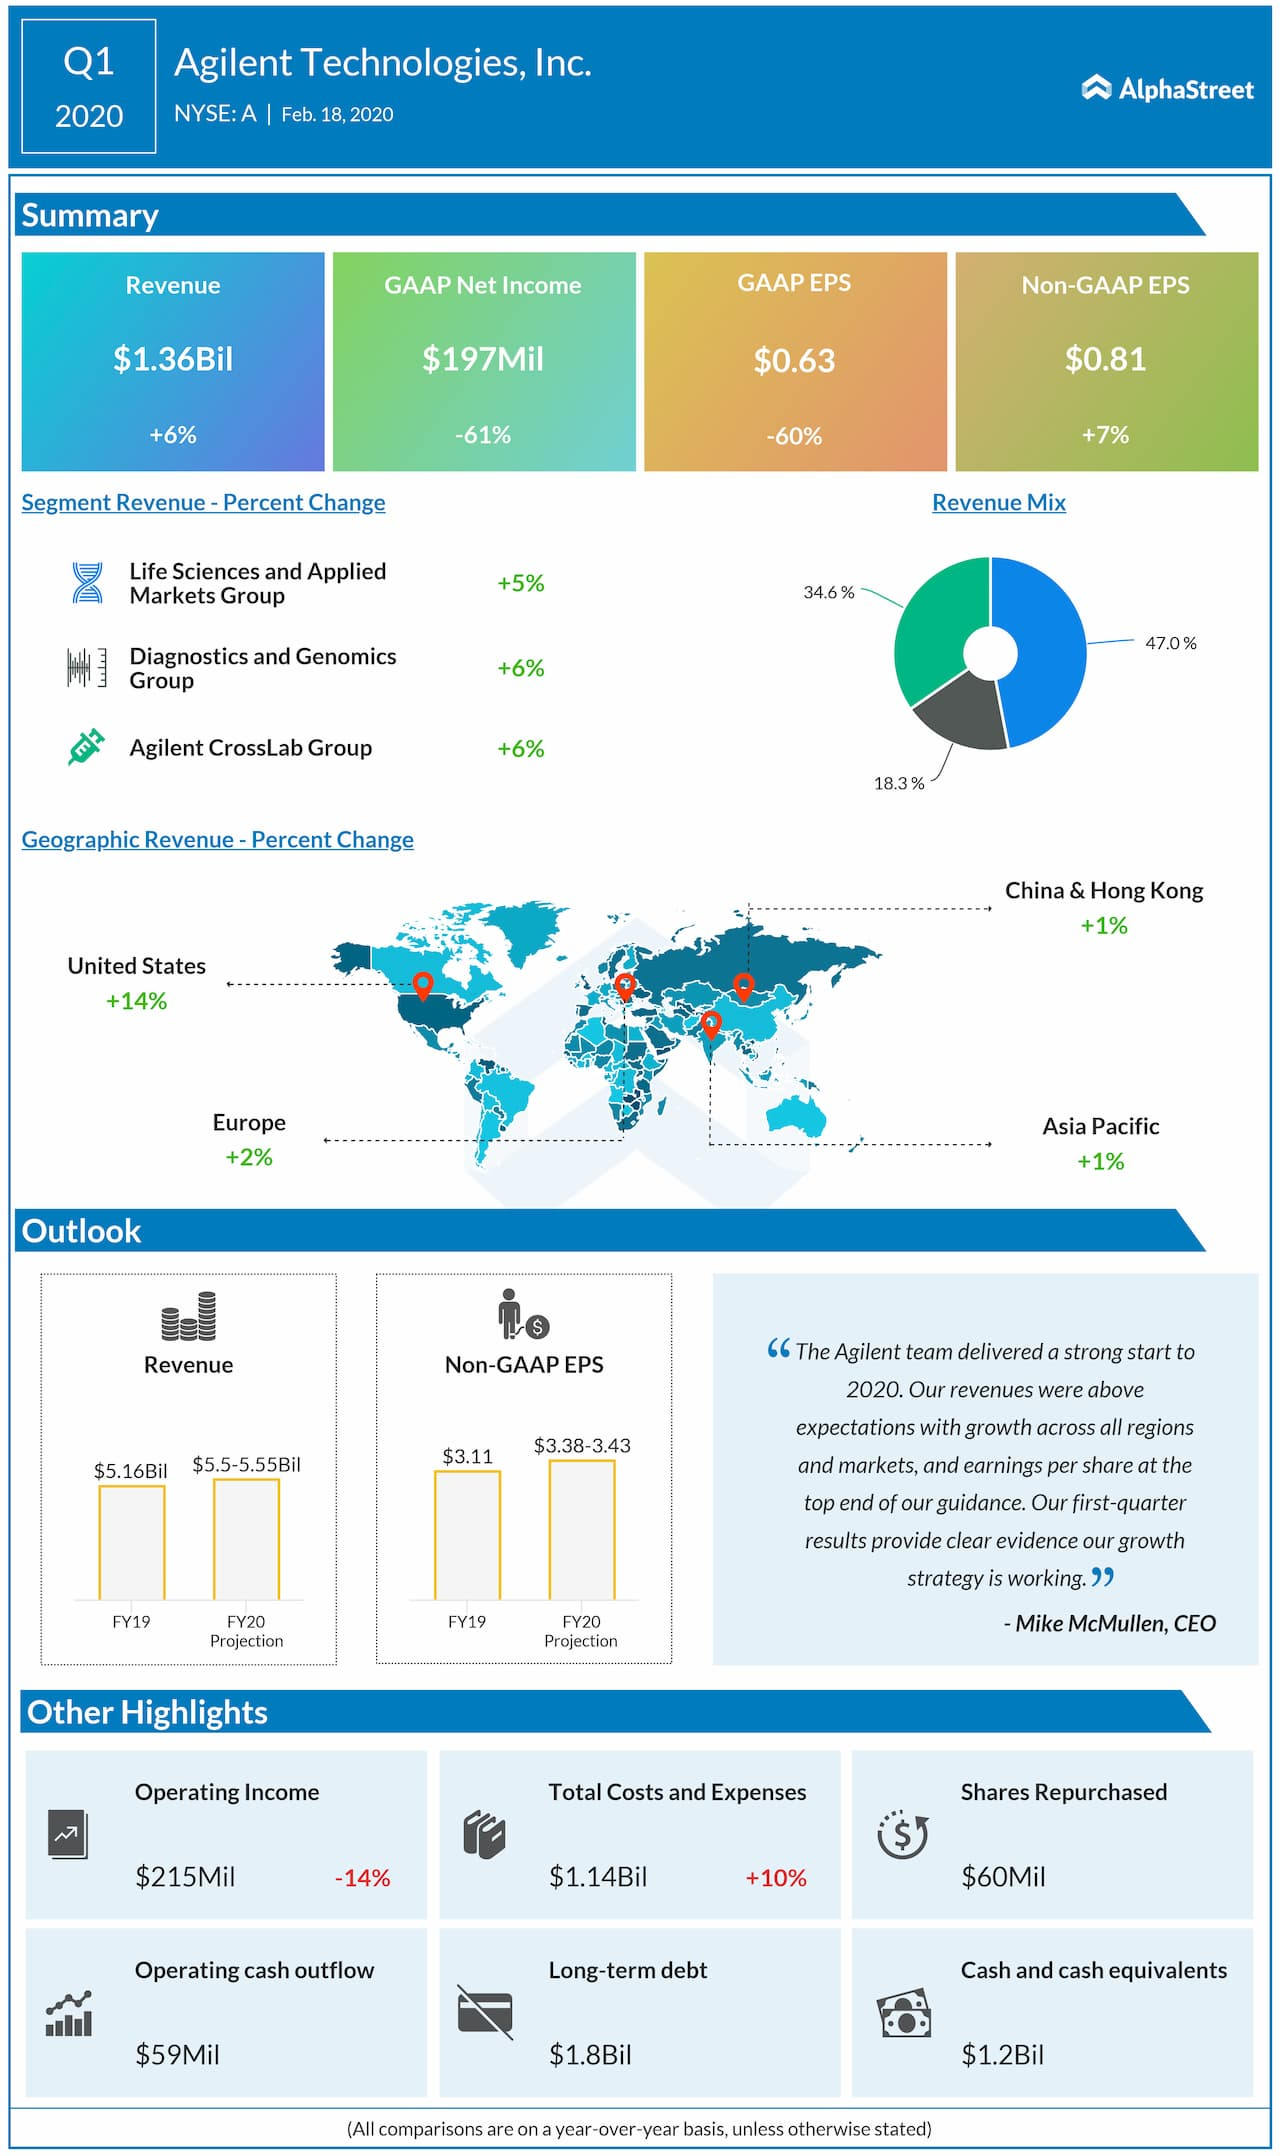 Agilent Technologies (A) Q1 2020 earnings snapshot